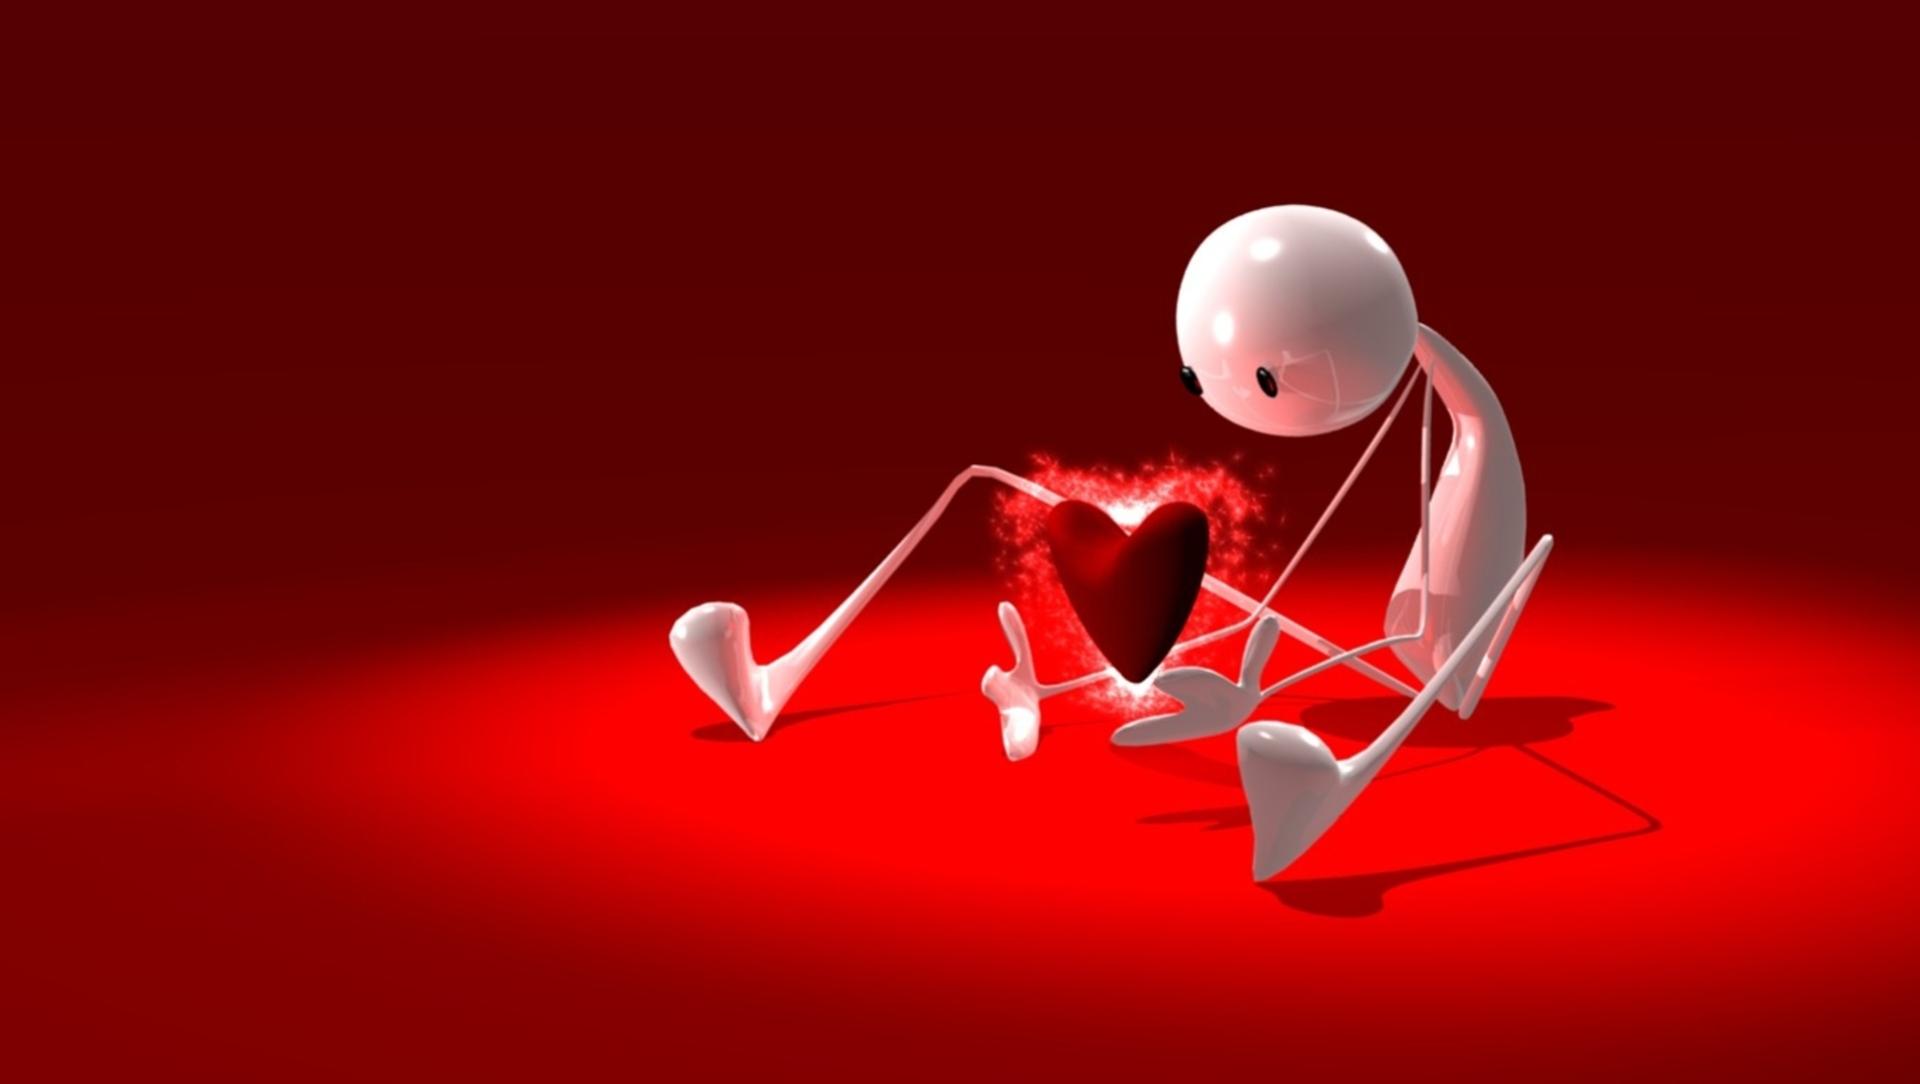 Pics Photos - Black Animated Heart